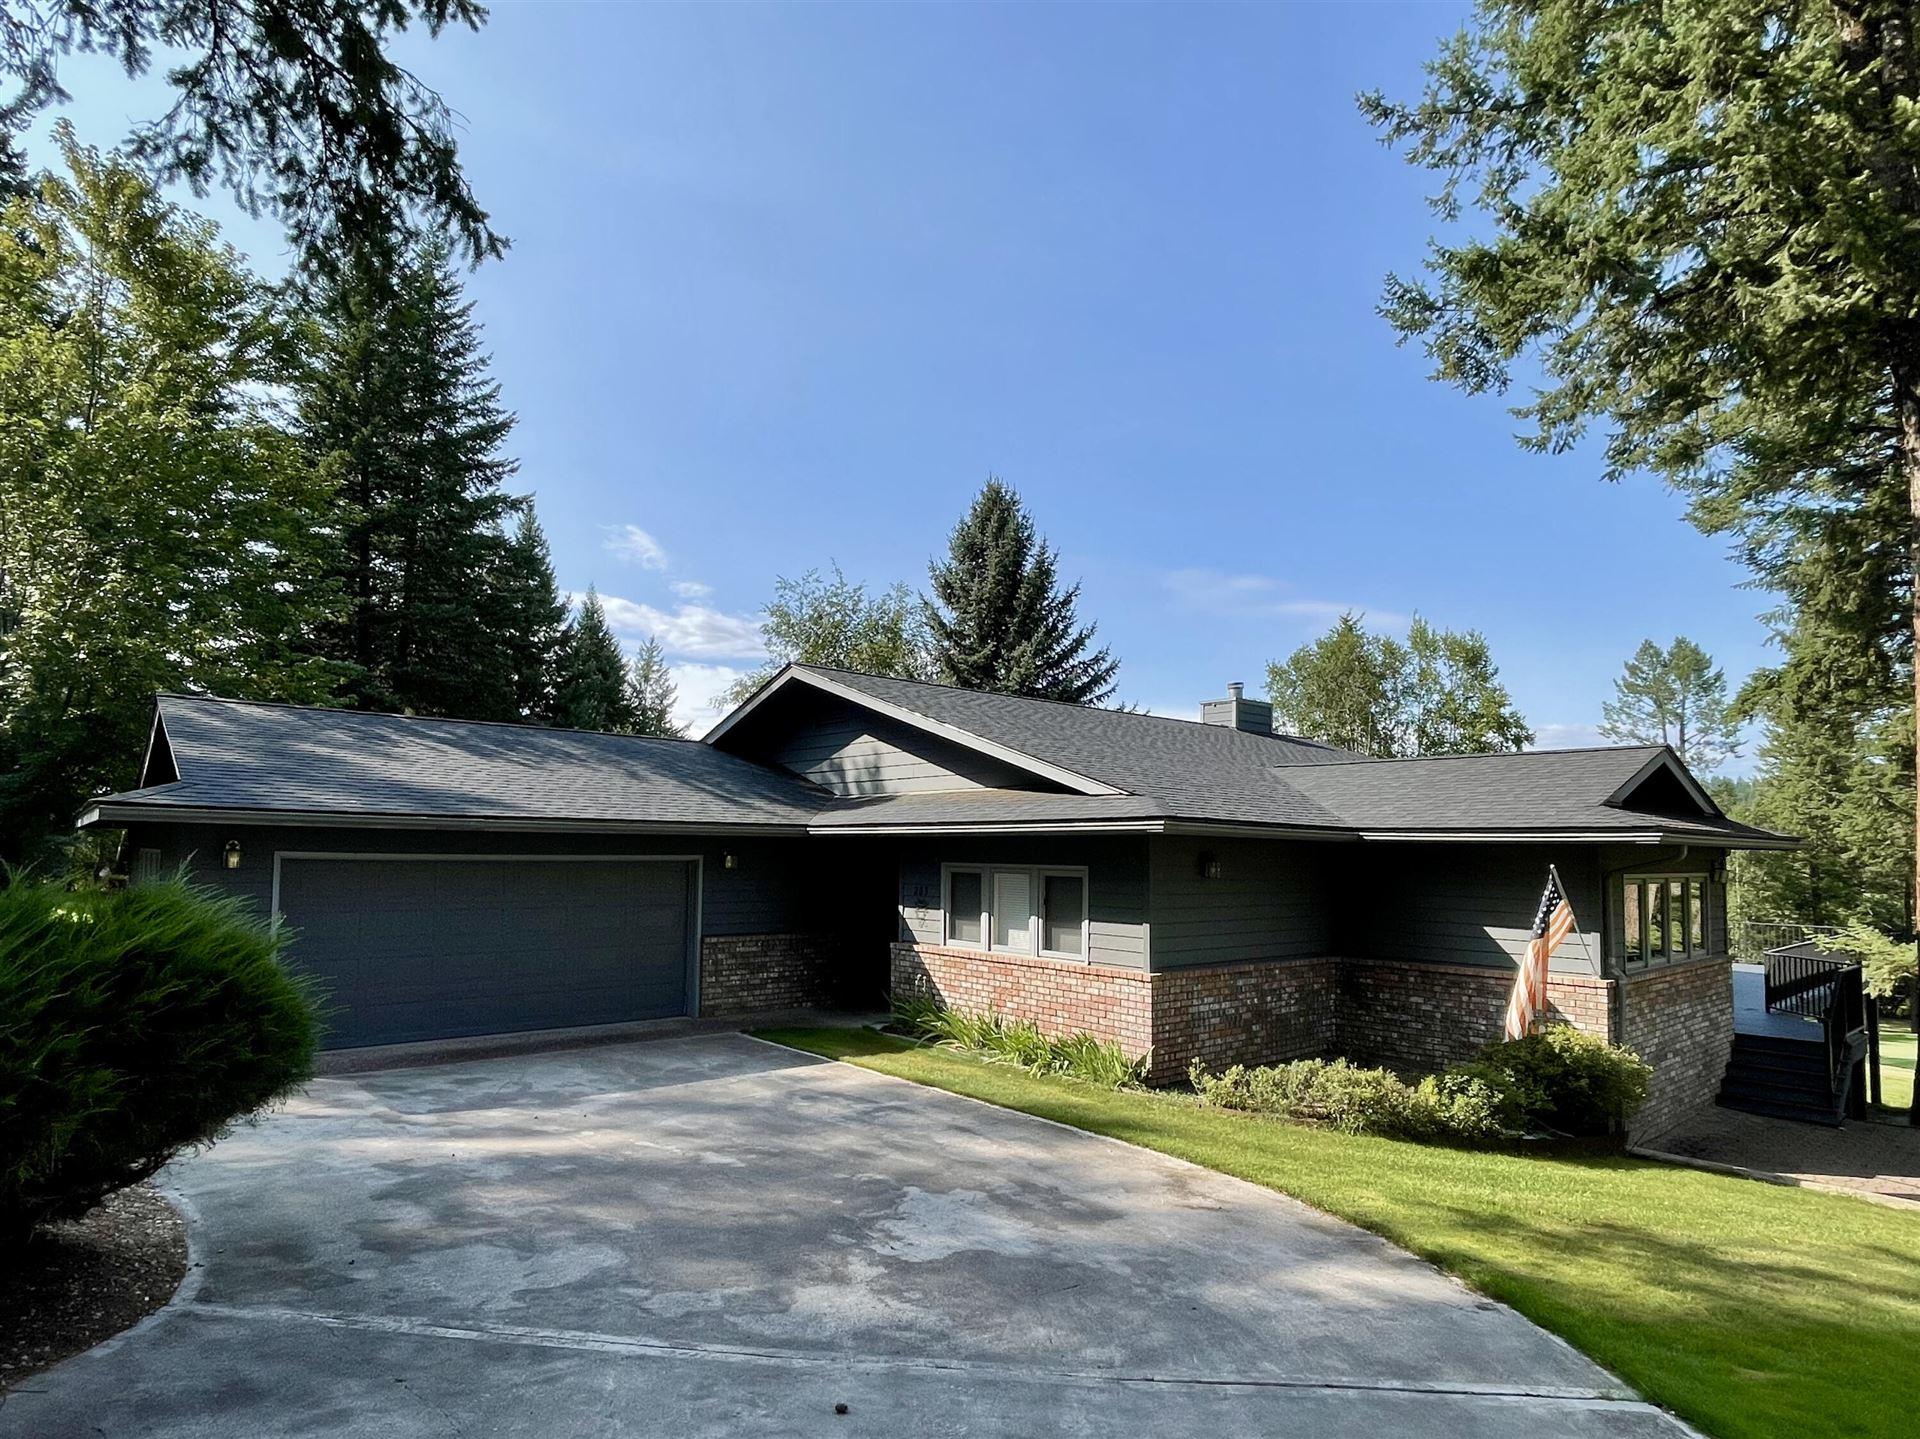 Photo for 203 Golf Terrace, Bigfork, MT 59911 (MLS # 22113411)